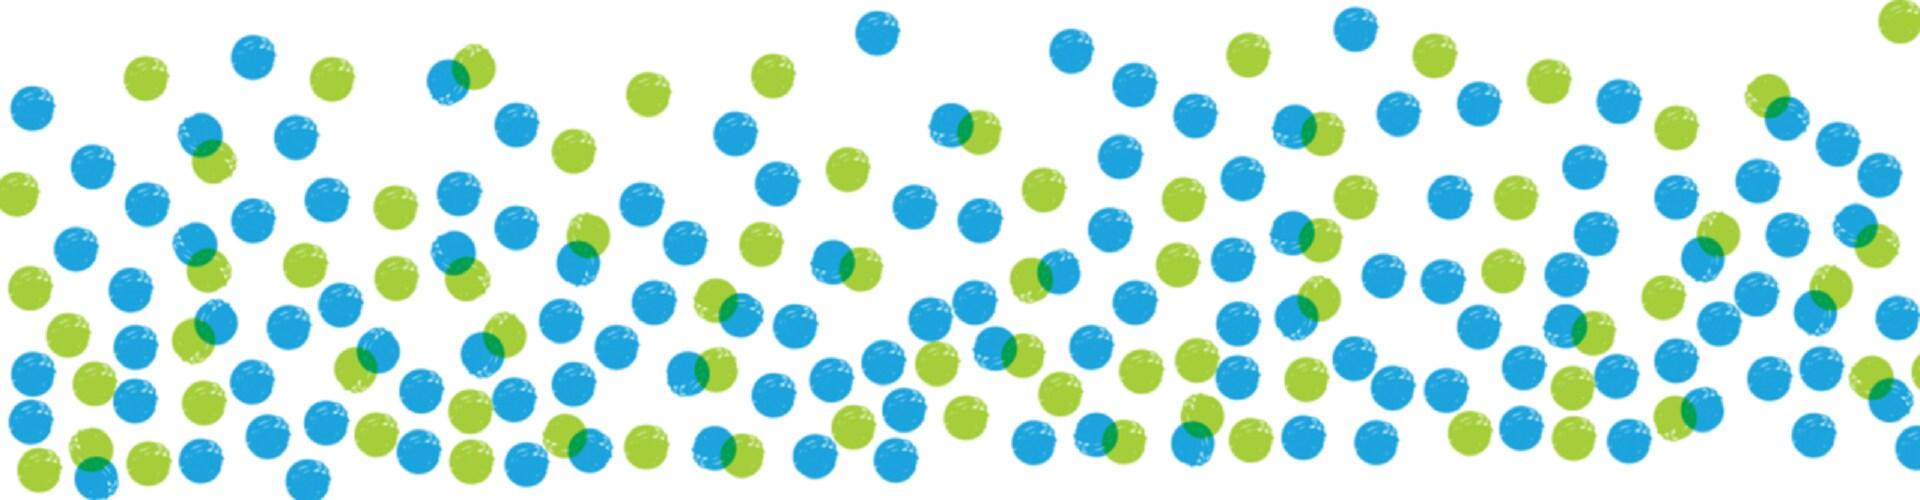 Dots   tidyhq format